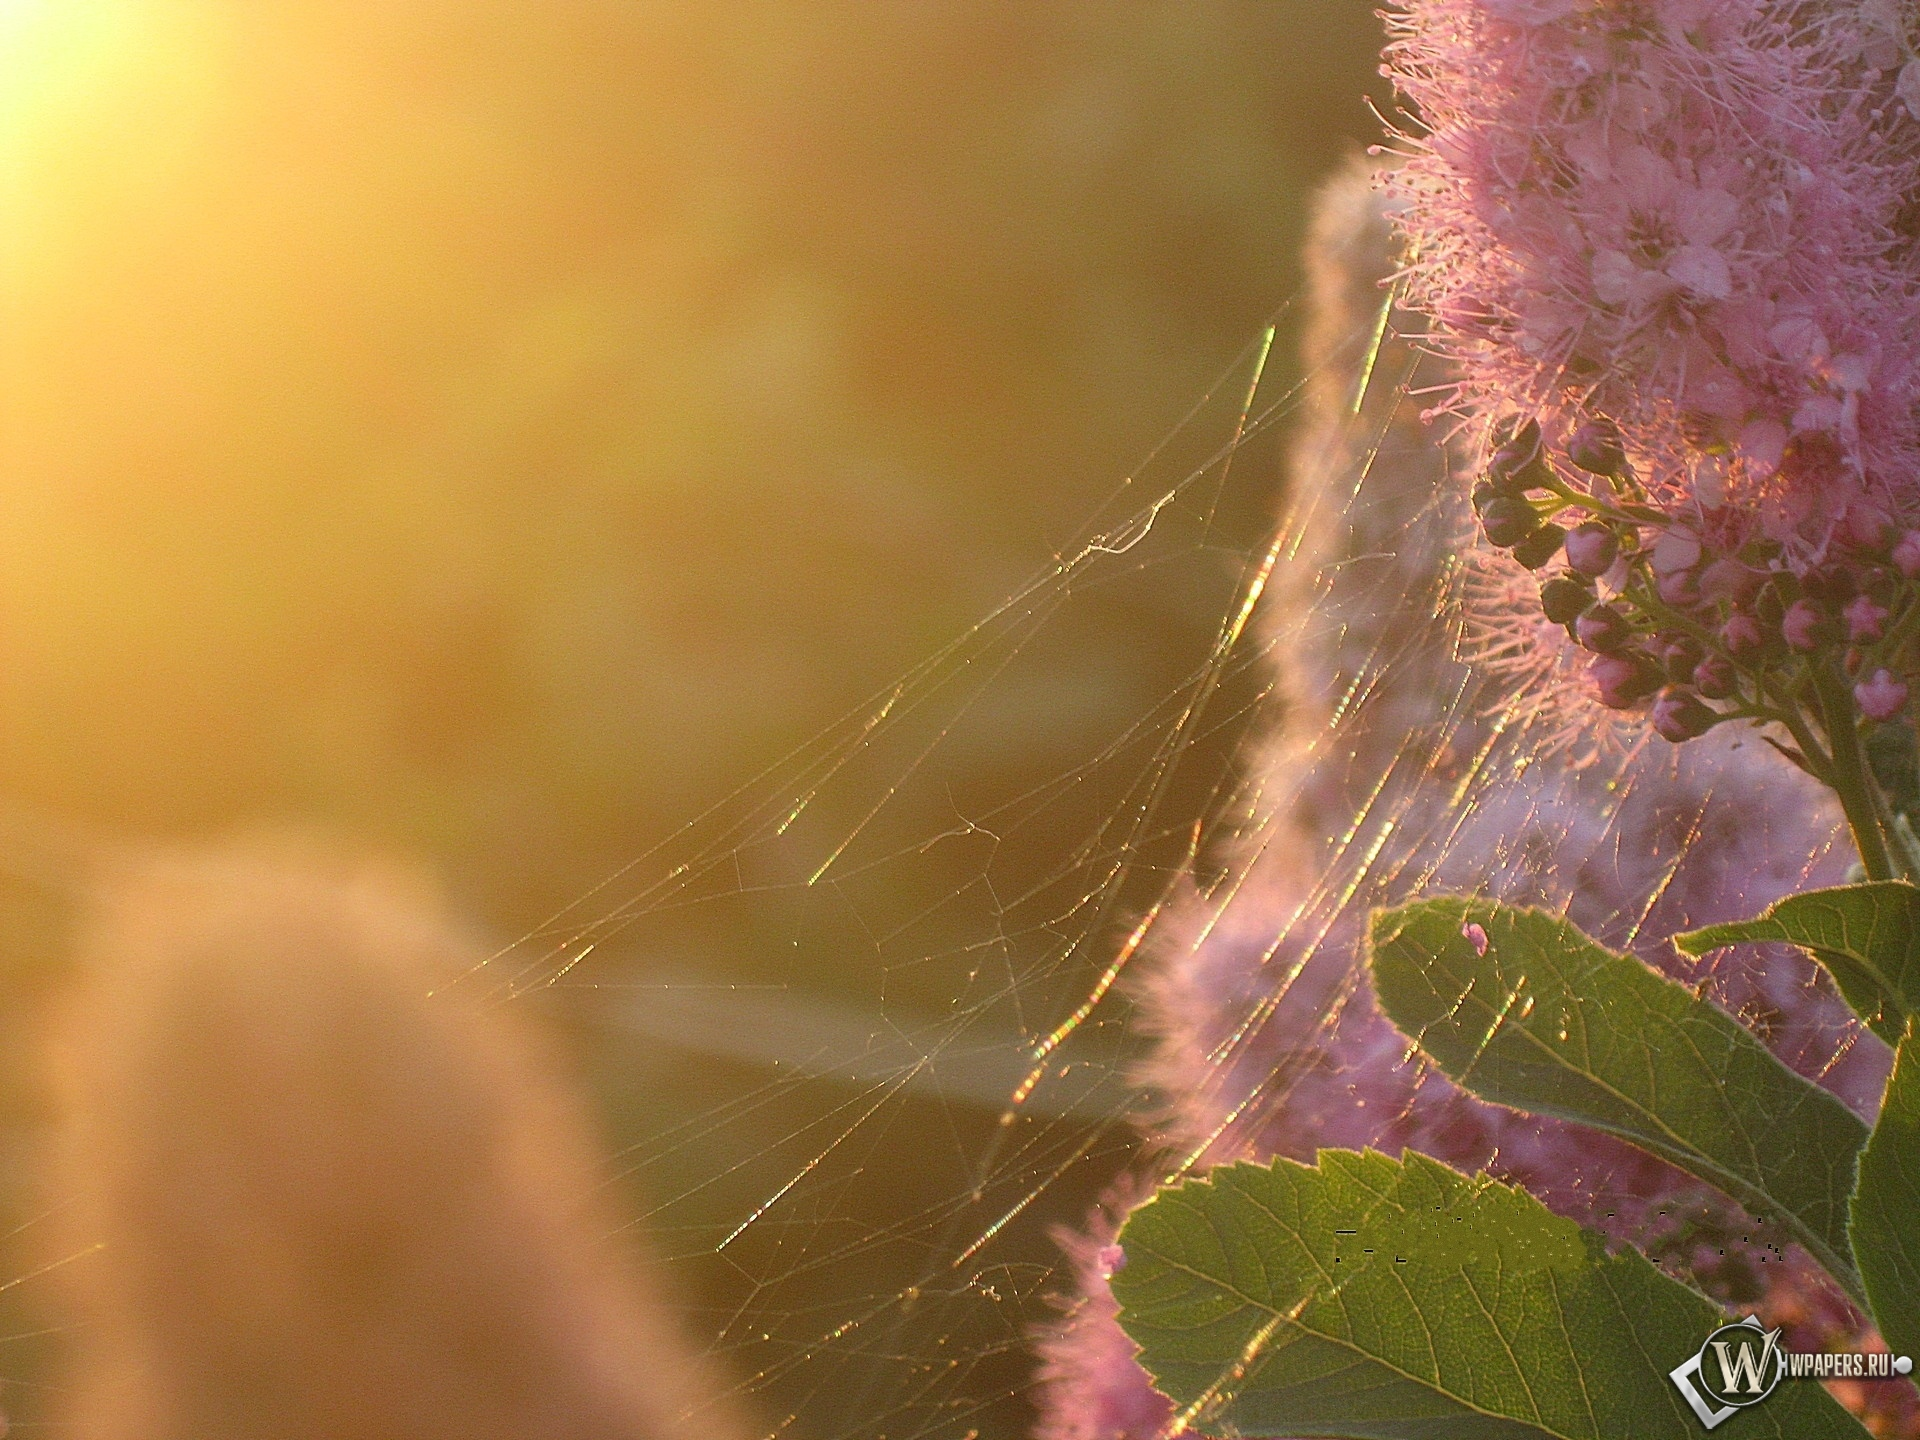 Золотая паутина 1920x1440